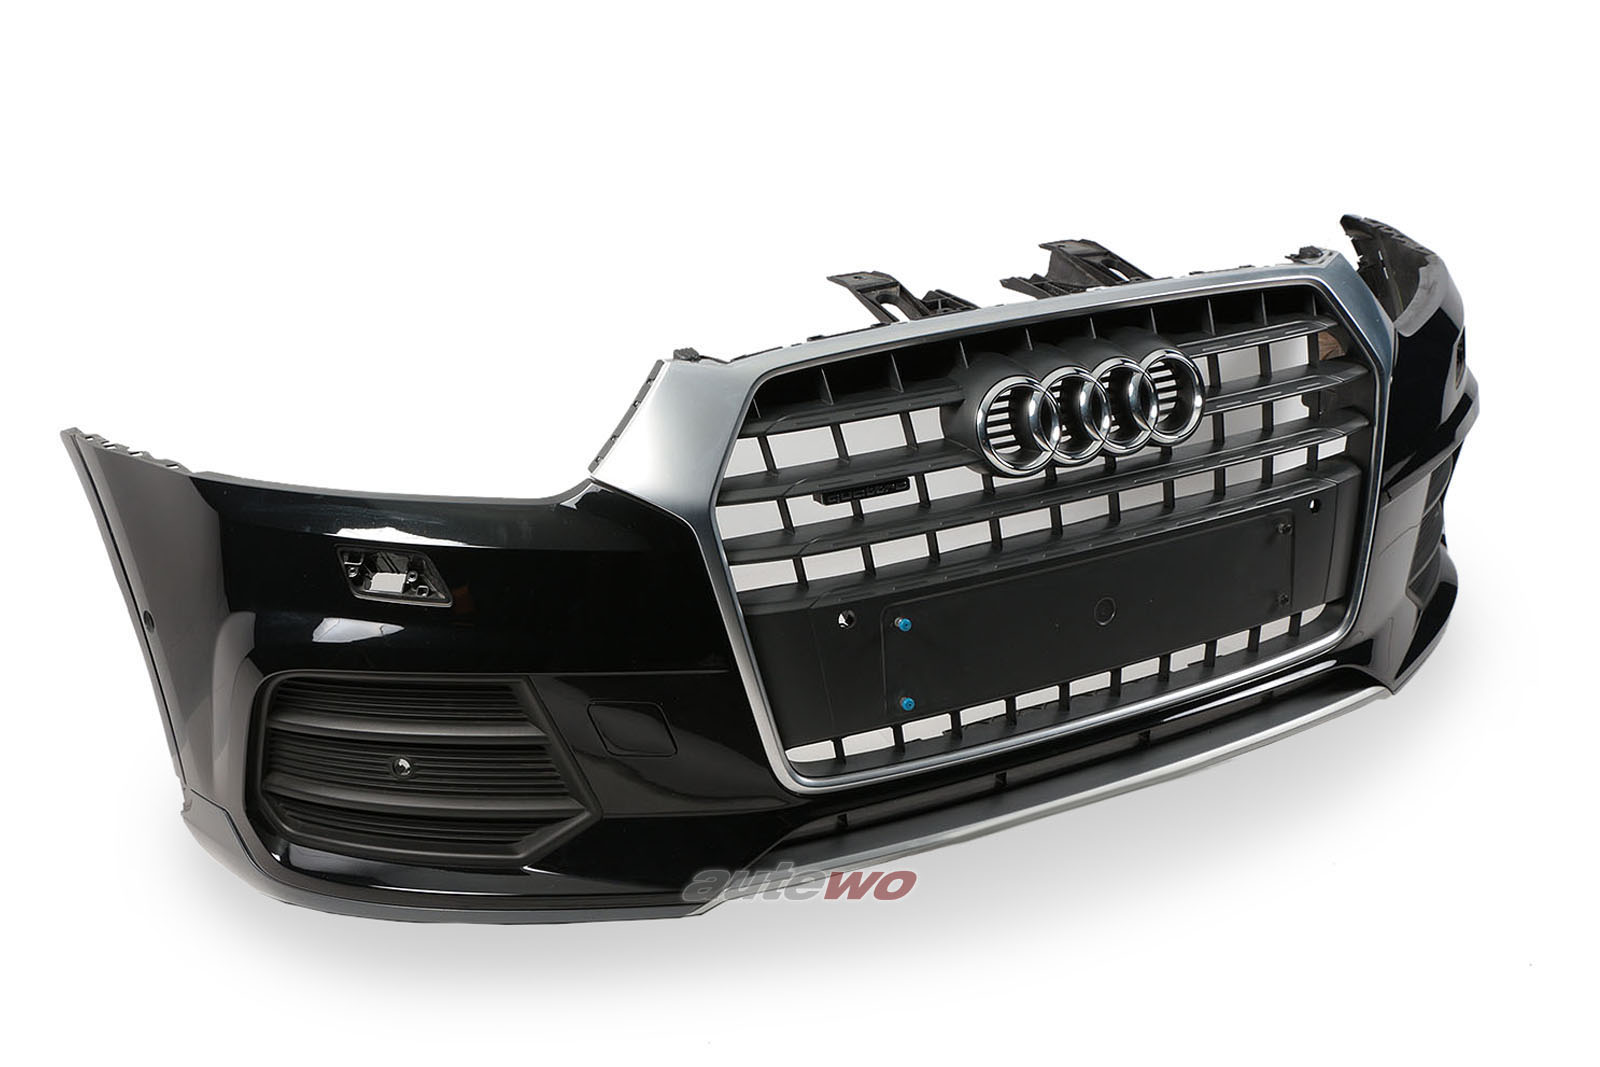 8U0807065L Audi Q3 8U Stoßstange vorne LY9T Mythosschwarz-metallic